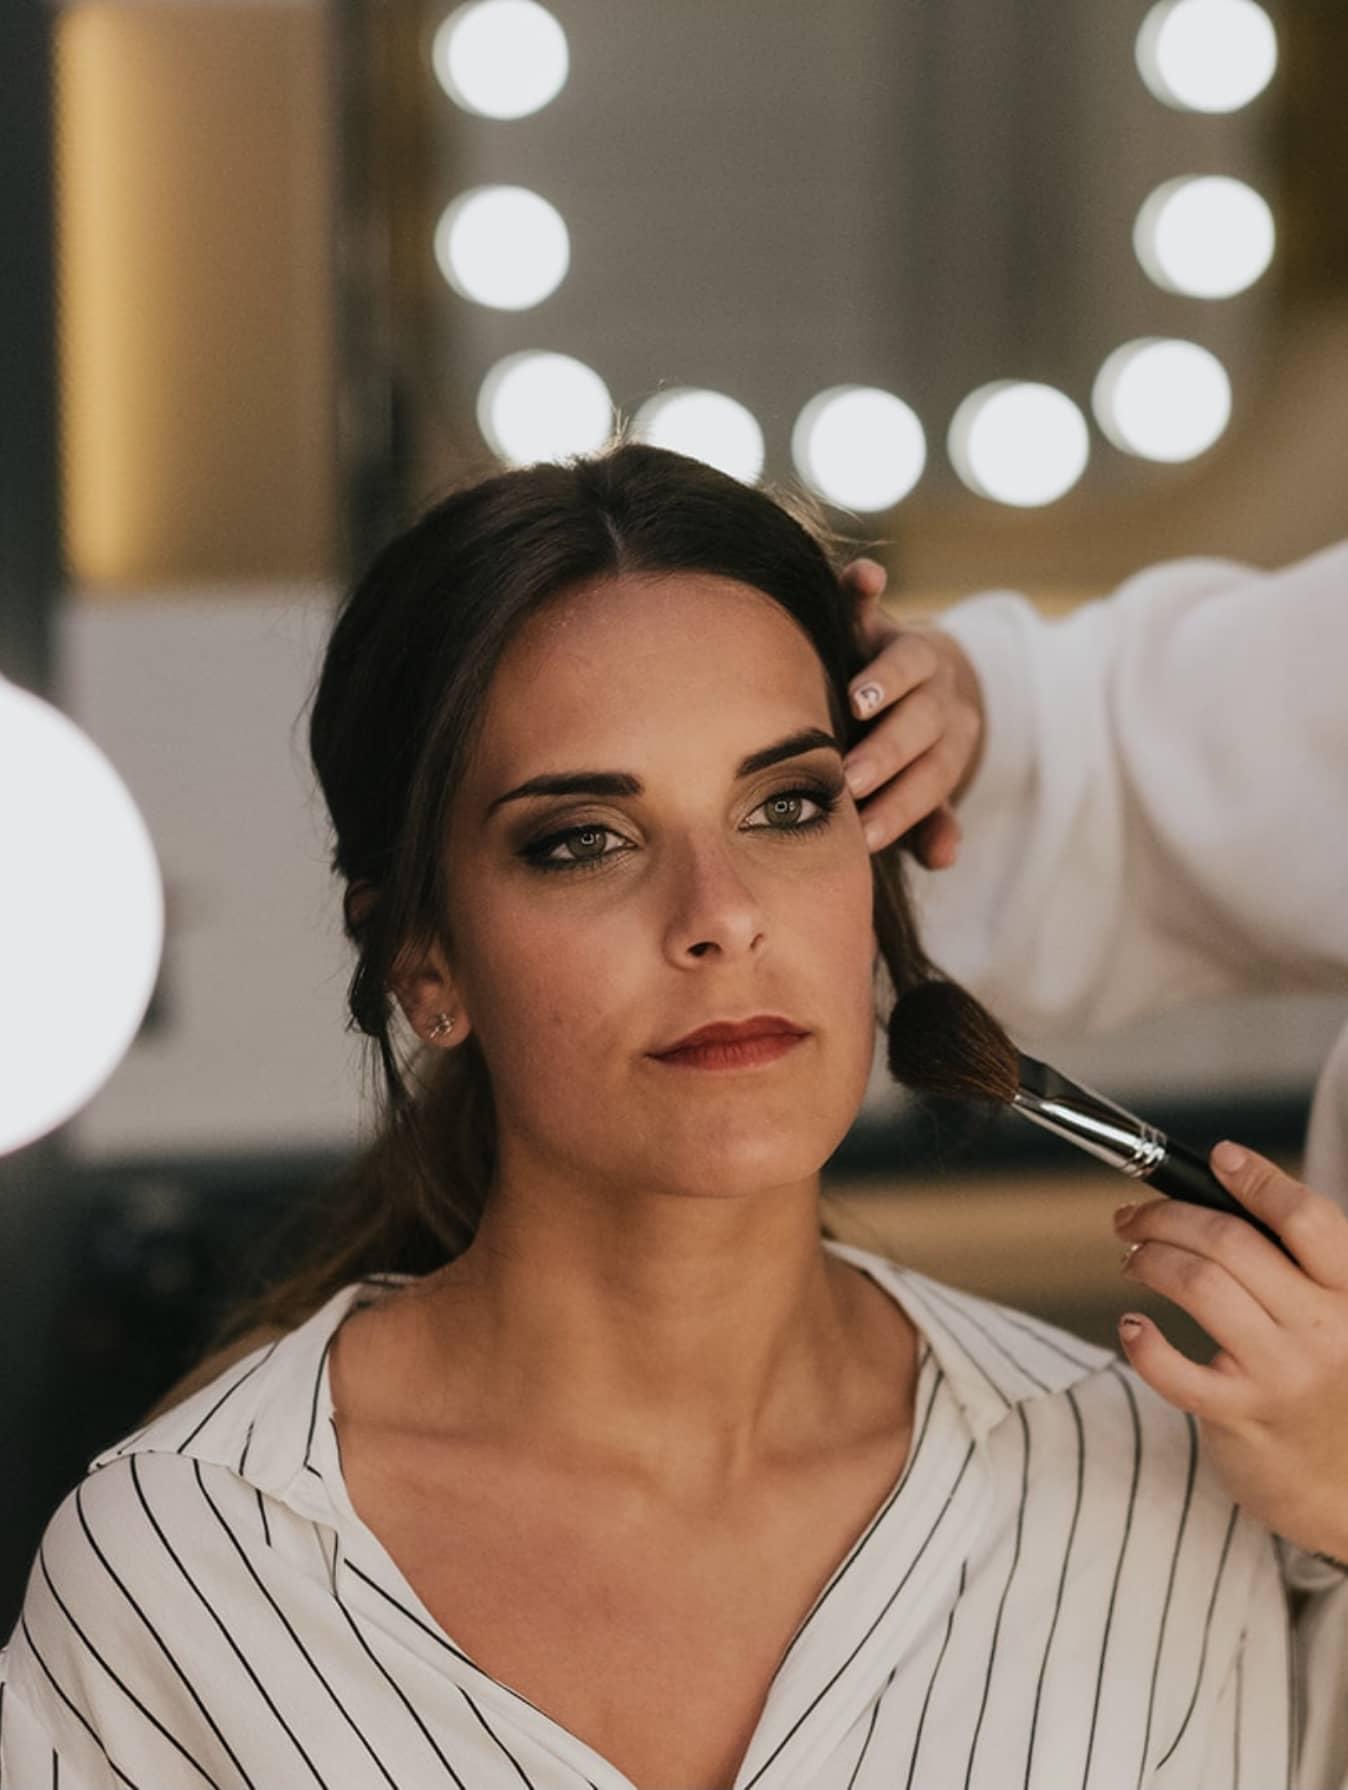 Maquillaje Profesional - Peluquería Fátima Albo